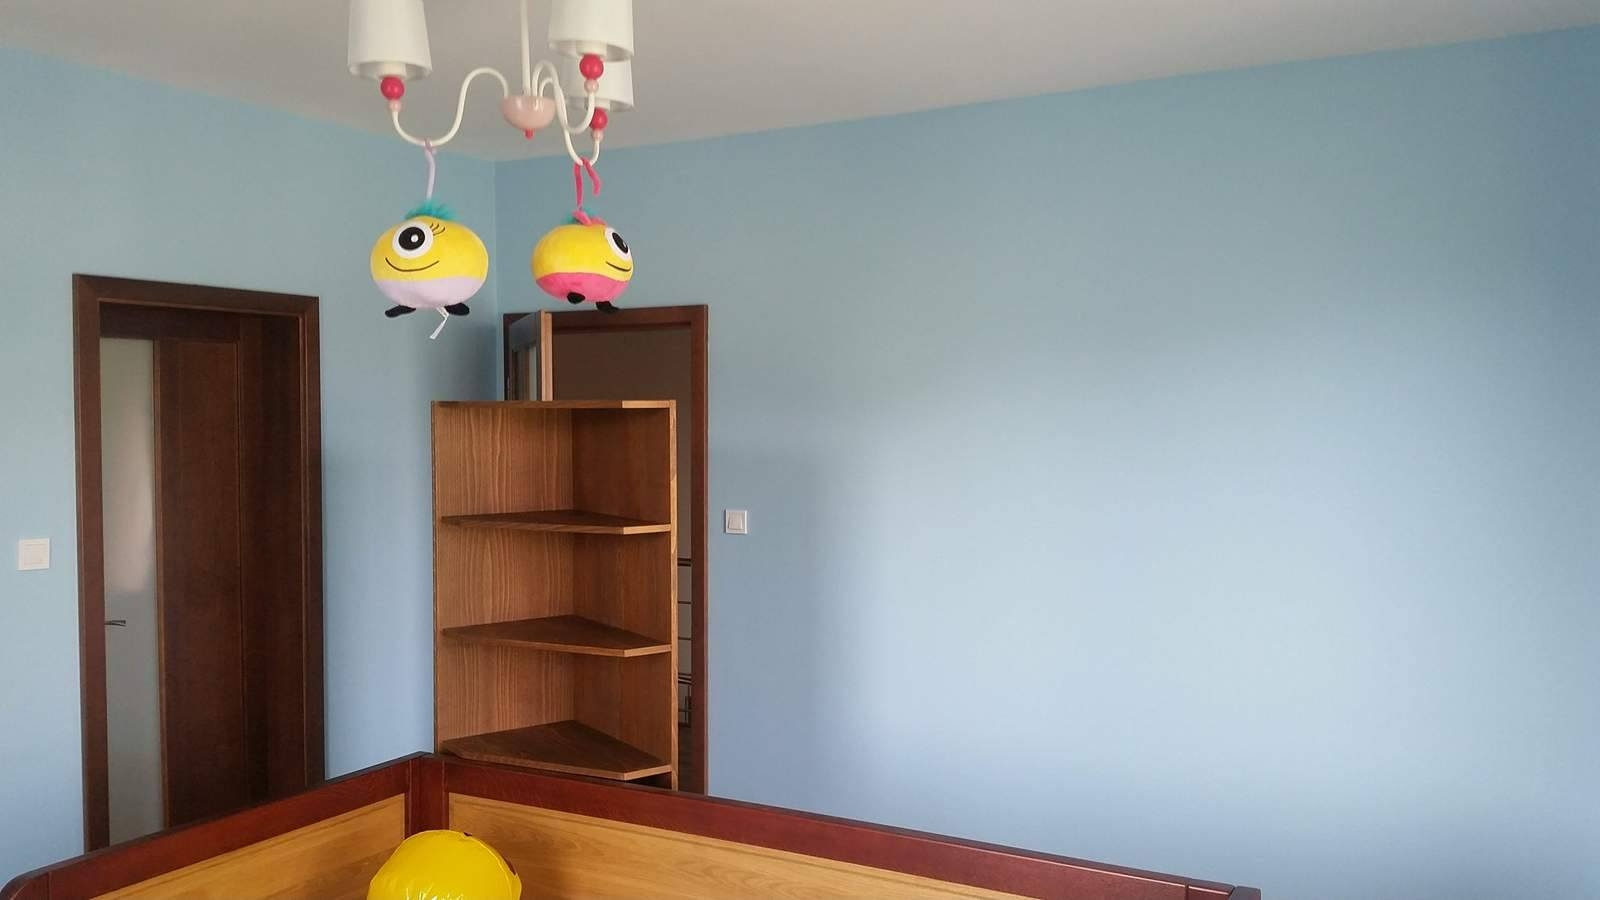 Súkromný byt 1750960699